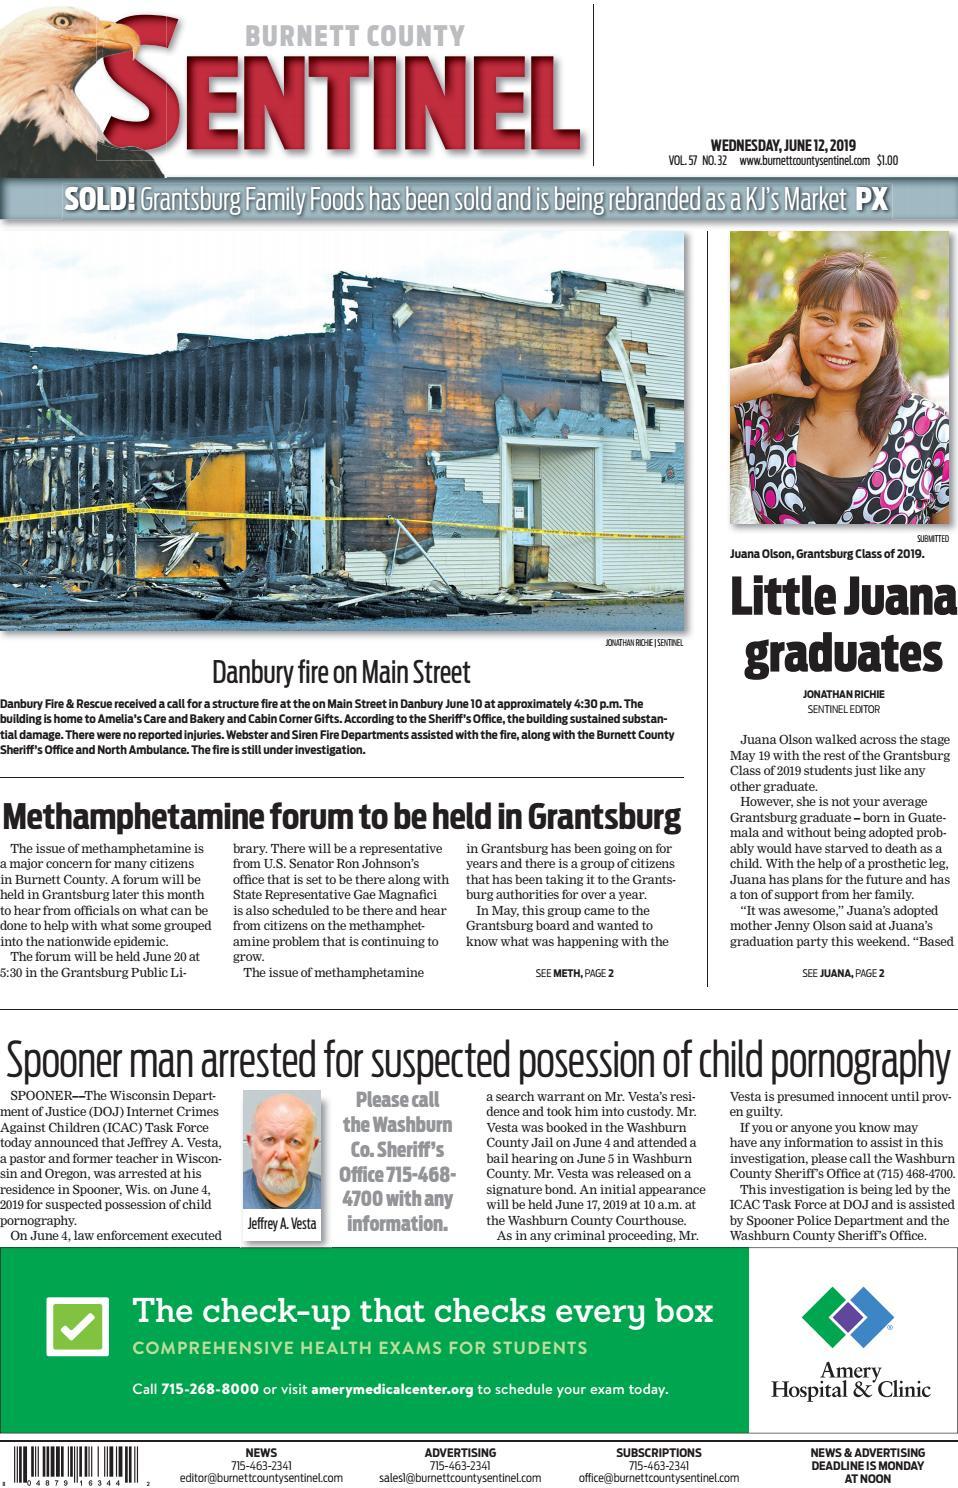 The Burnett County Sentinel 06-12-2019 by Burnett County Sentinel